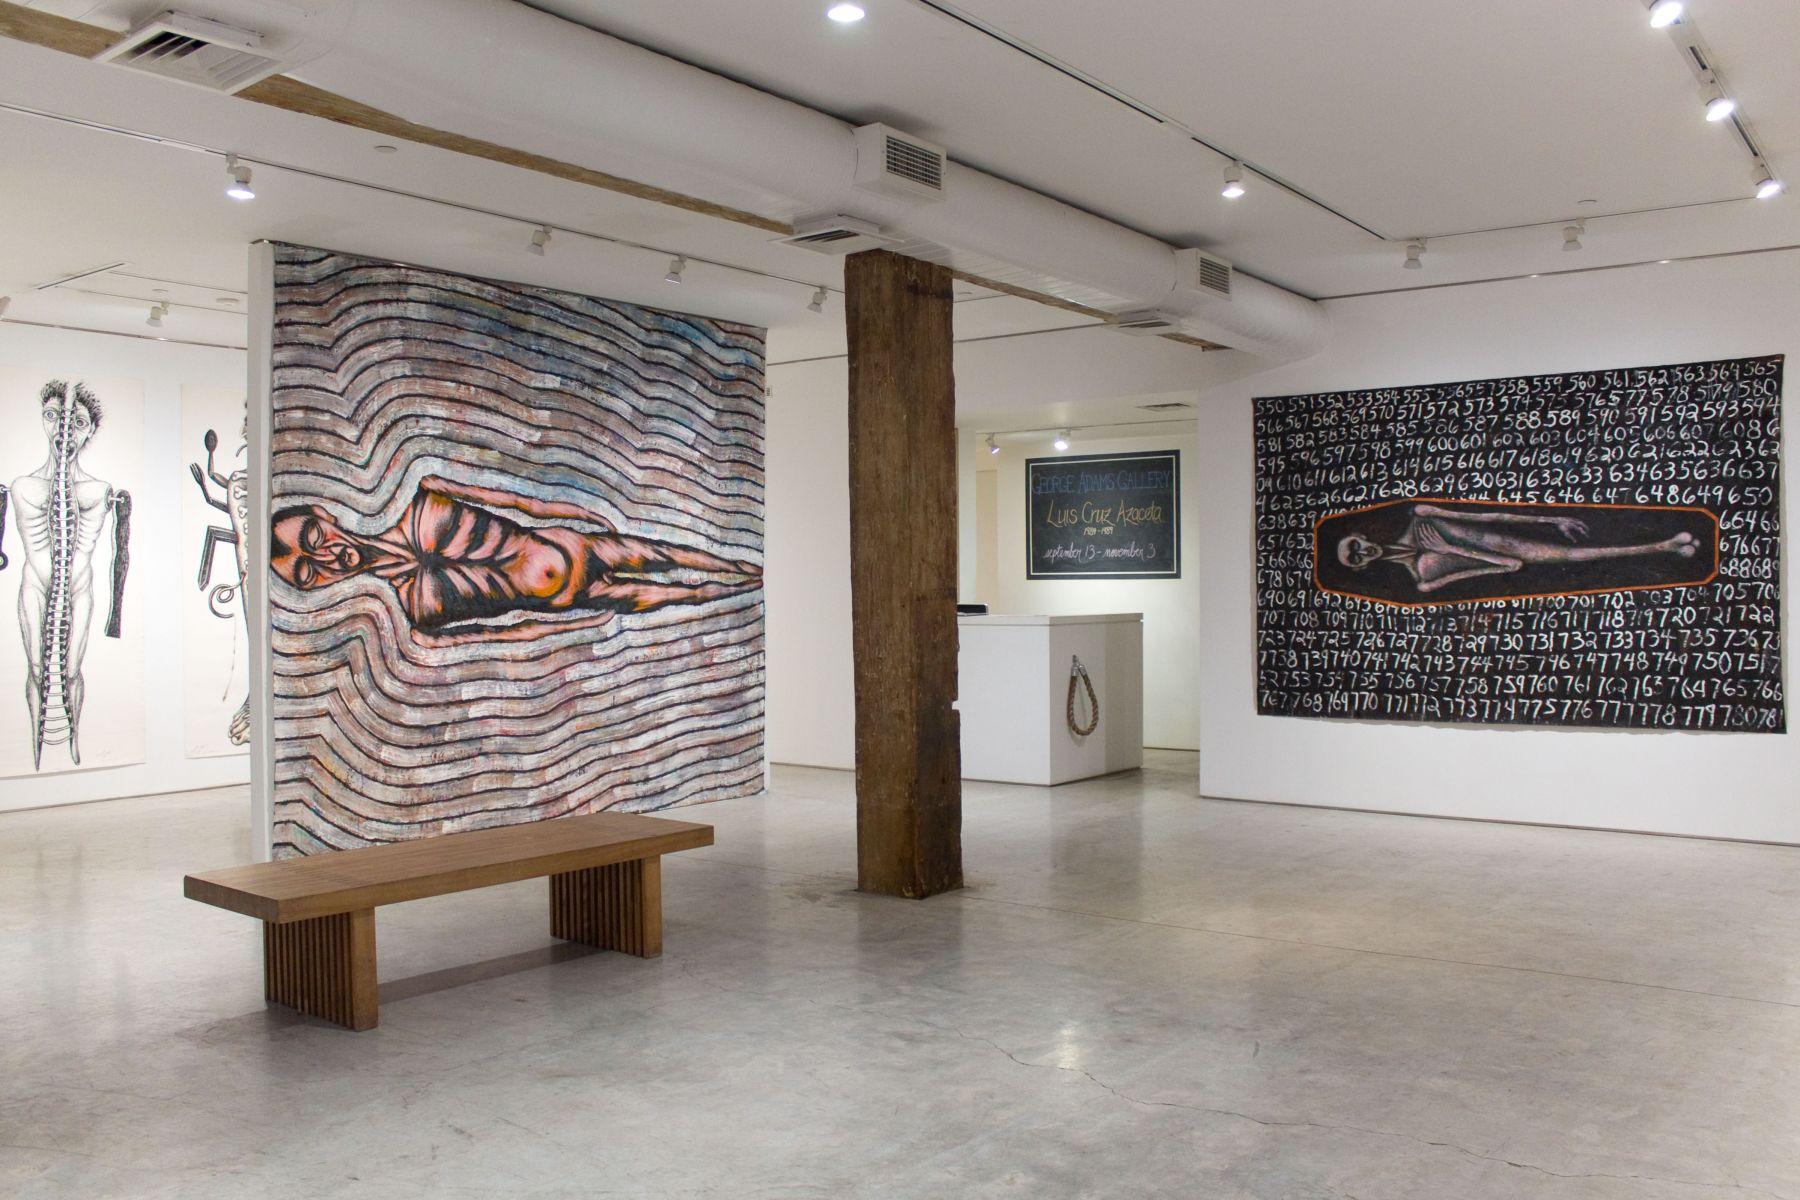 Installation view, Luis Cruz Azaceta: 1984-1989, George Adams Gallery, New York, 2018